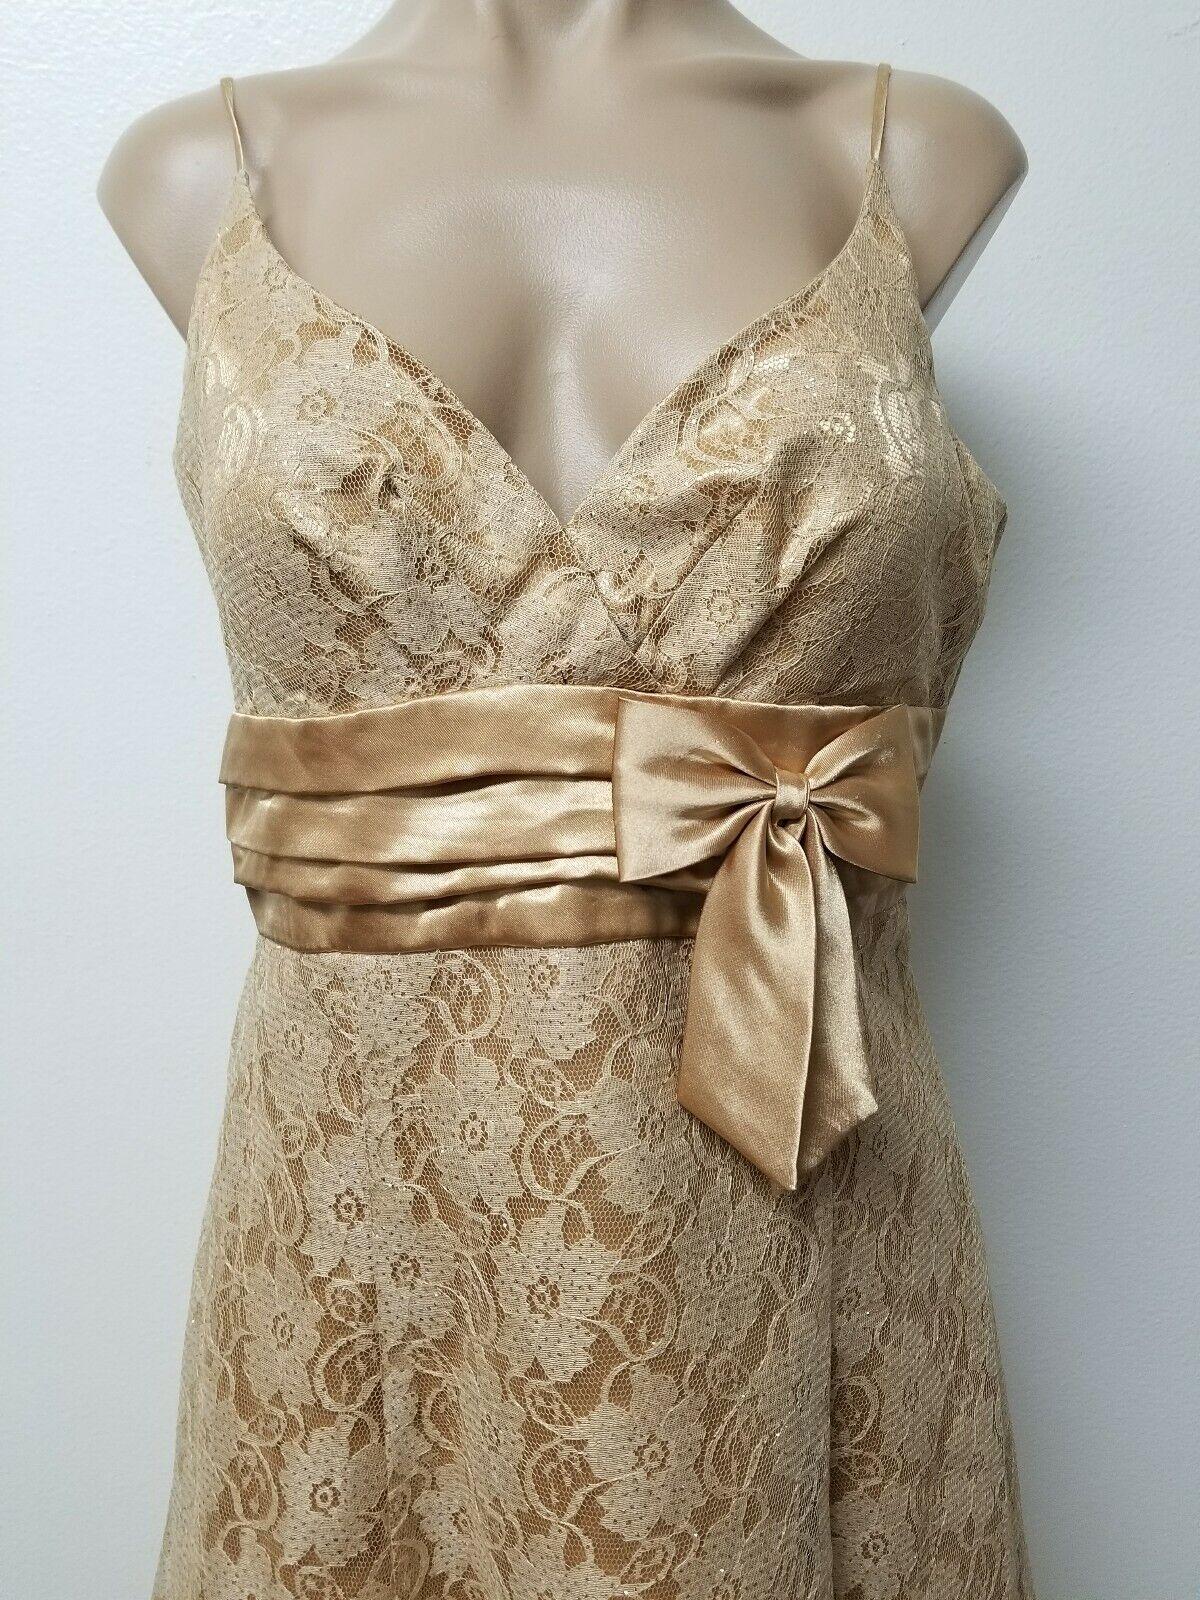 Vintage 90s Masquarade Spaghetti Strap gold lace Glitter Formal Prom Dress 11 12